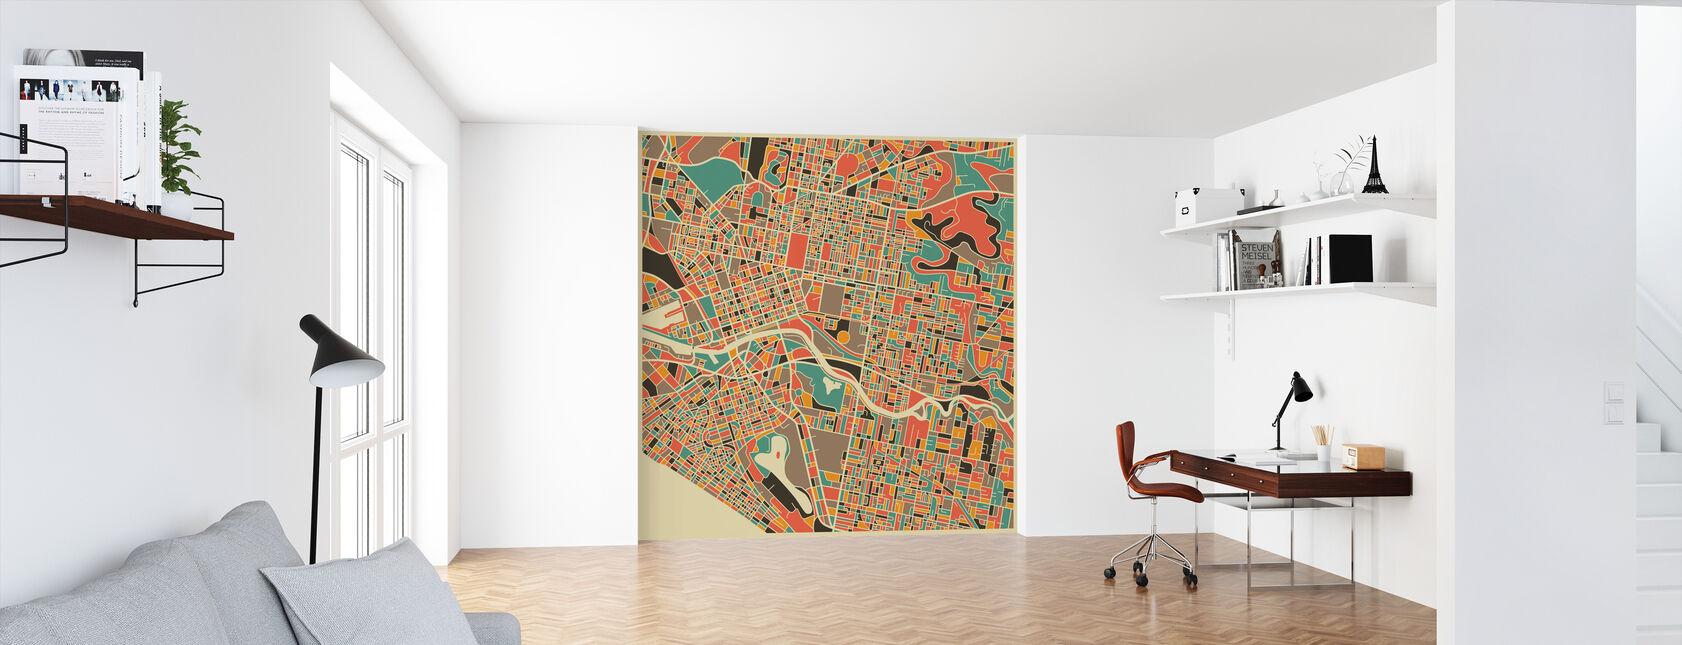 Multicolor Map - Melbourne - Wallpaper - Office